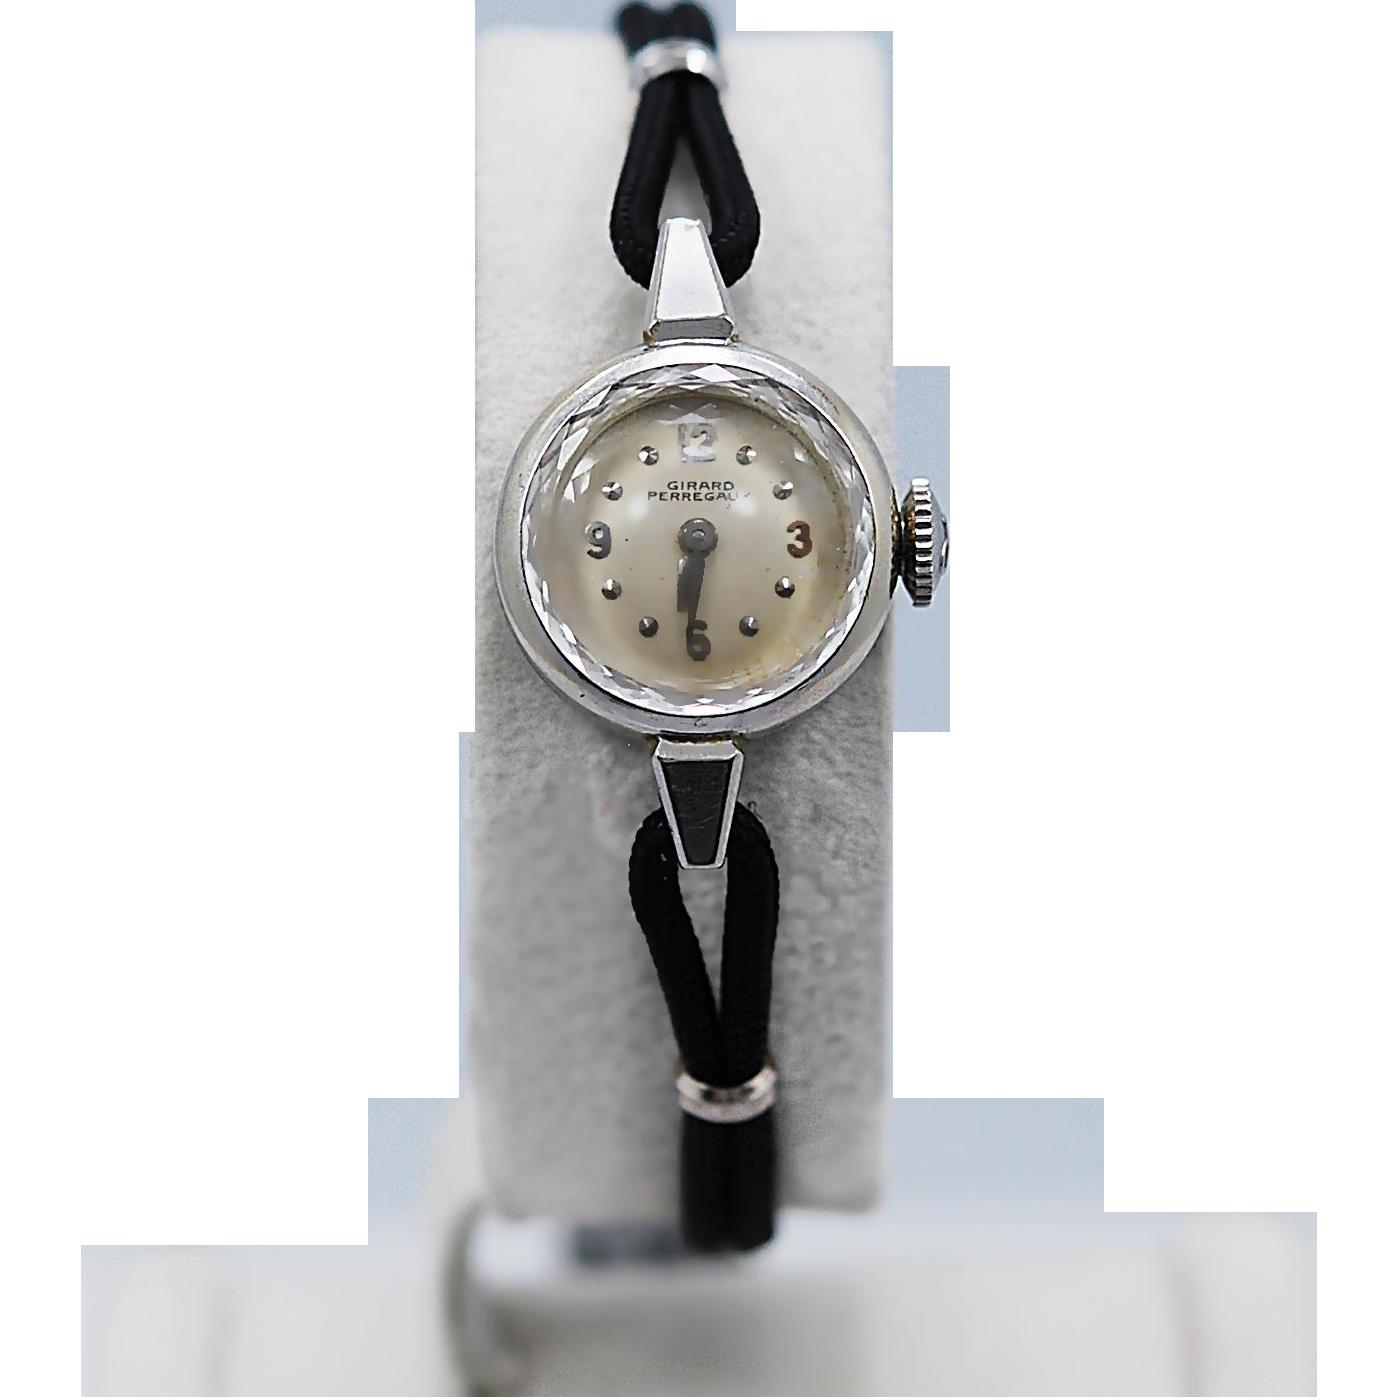 Ladies Girard Perregaux Watch c.1930's-1940's White Gold